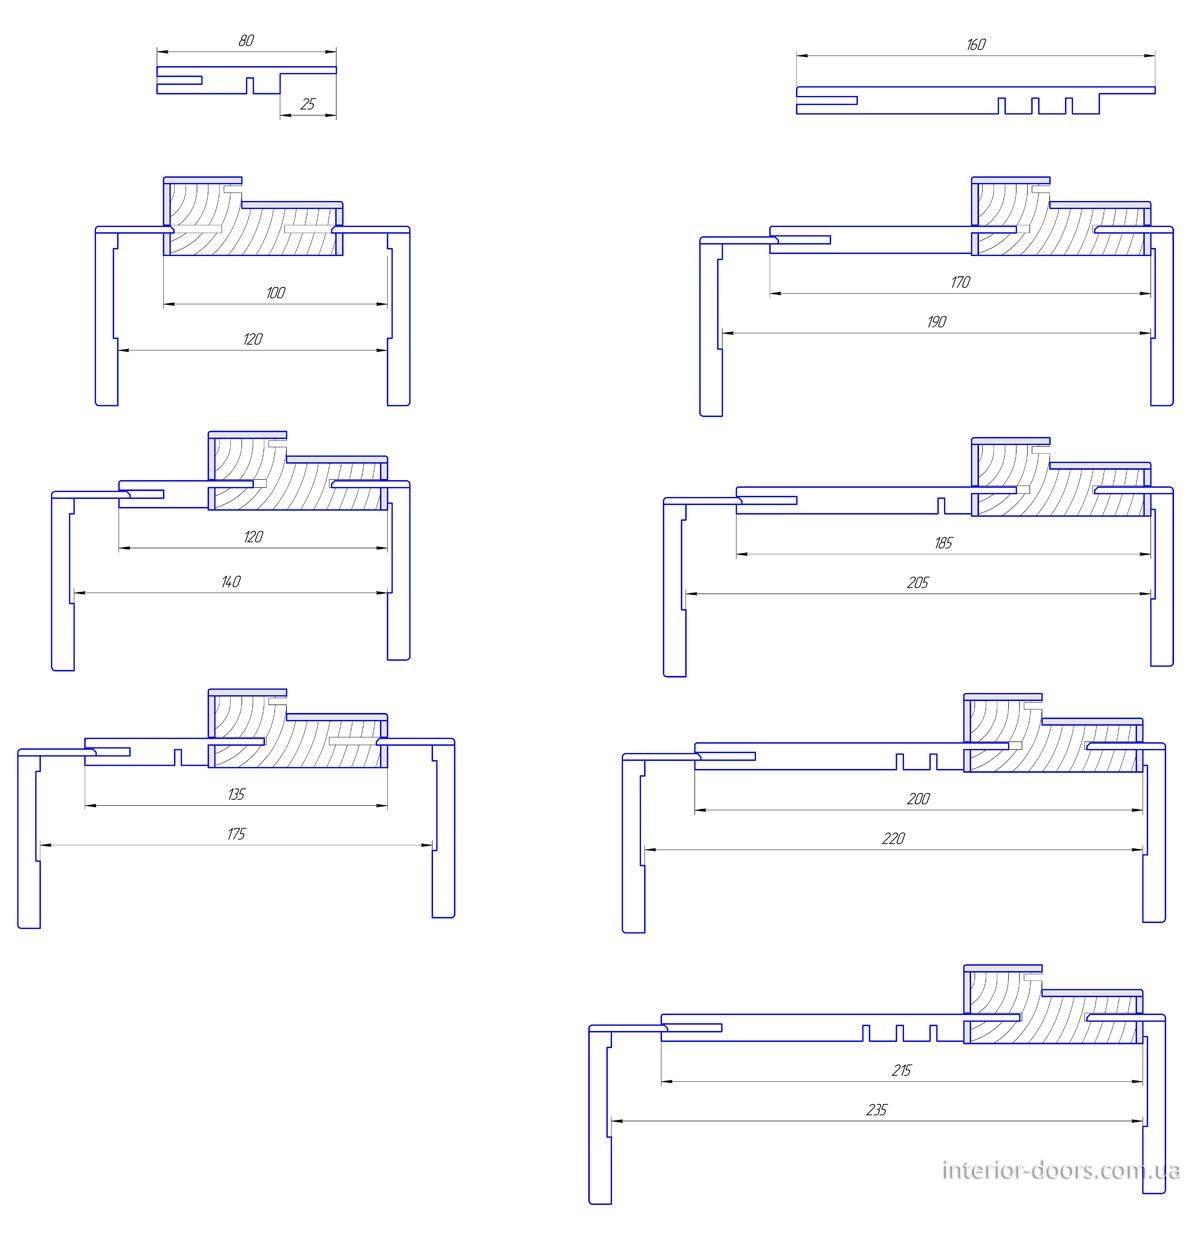 Регулировка коробки Standart Lux Емаль